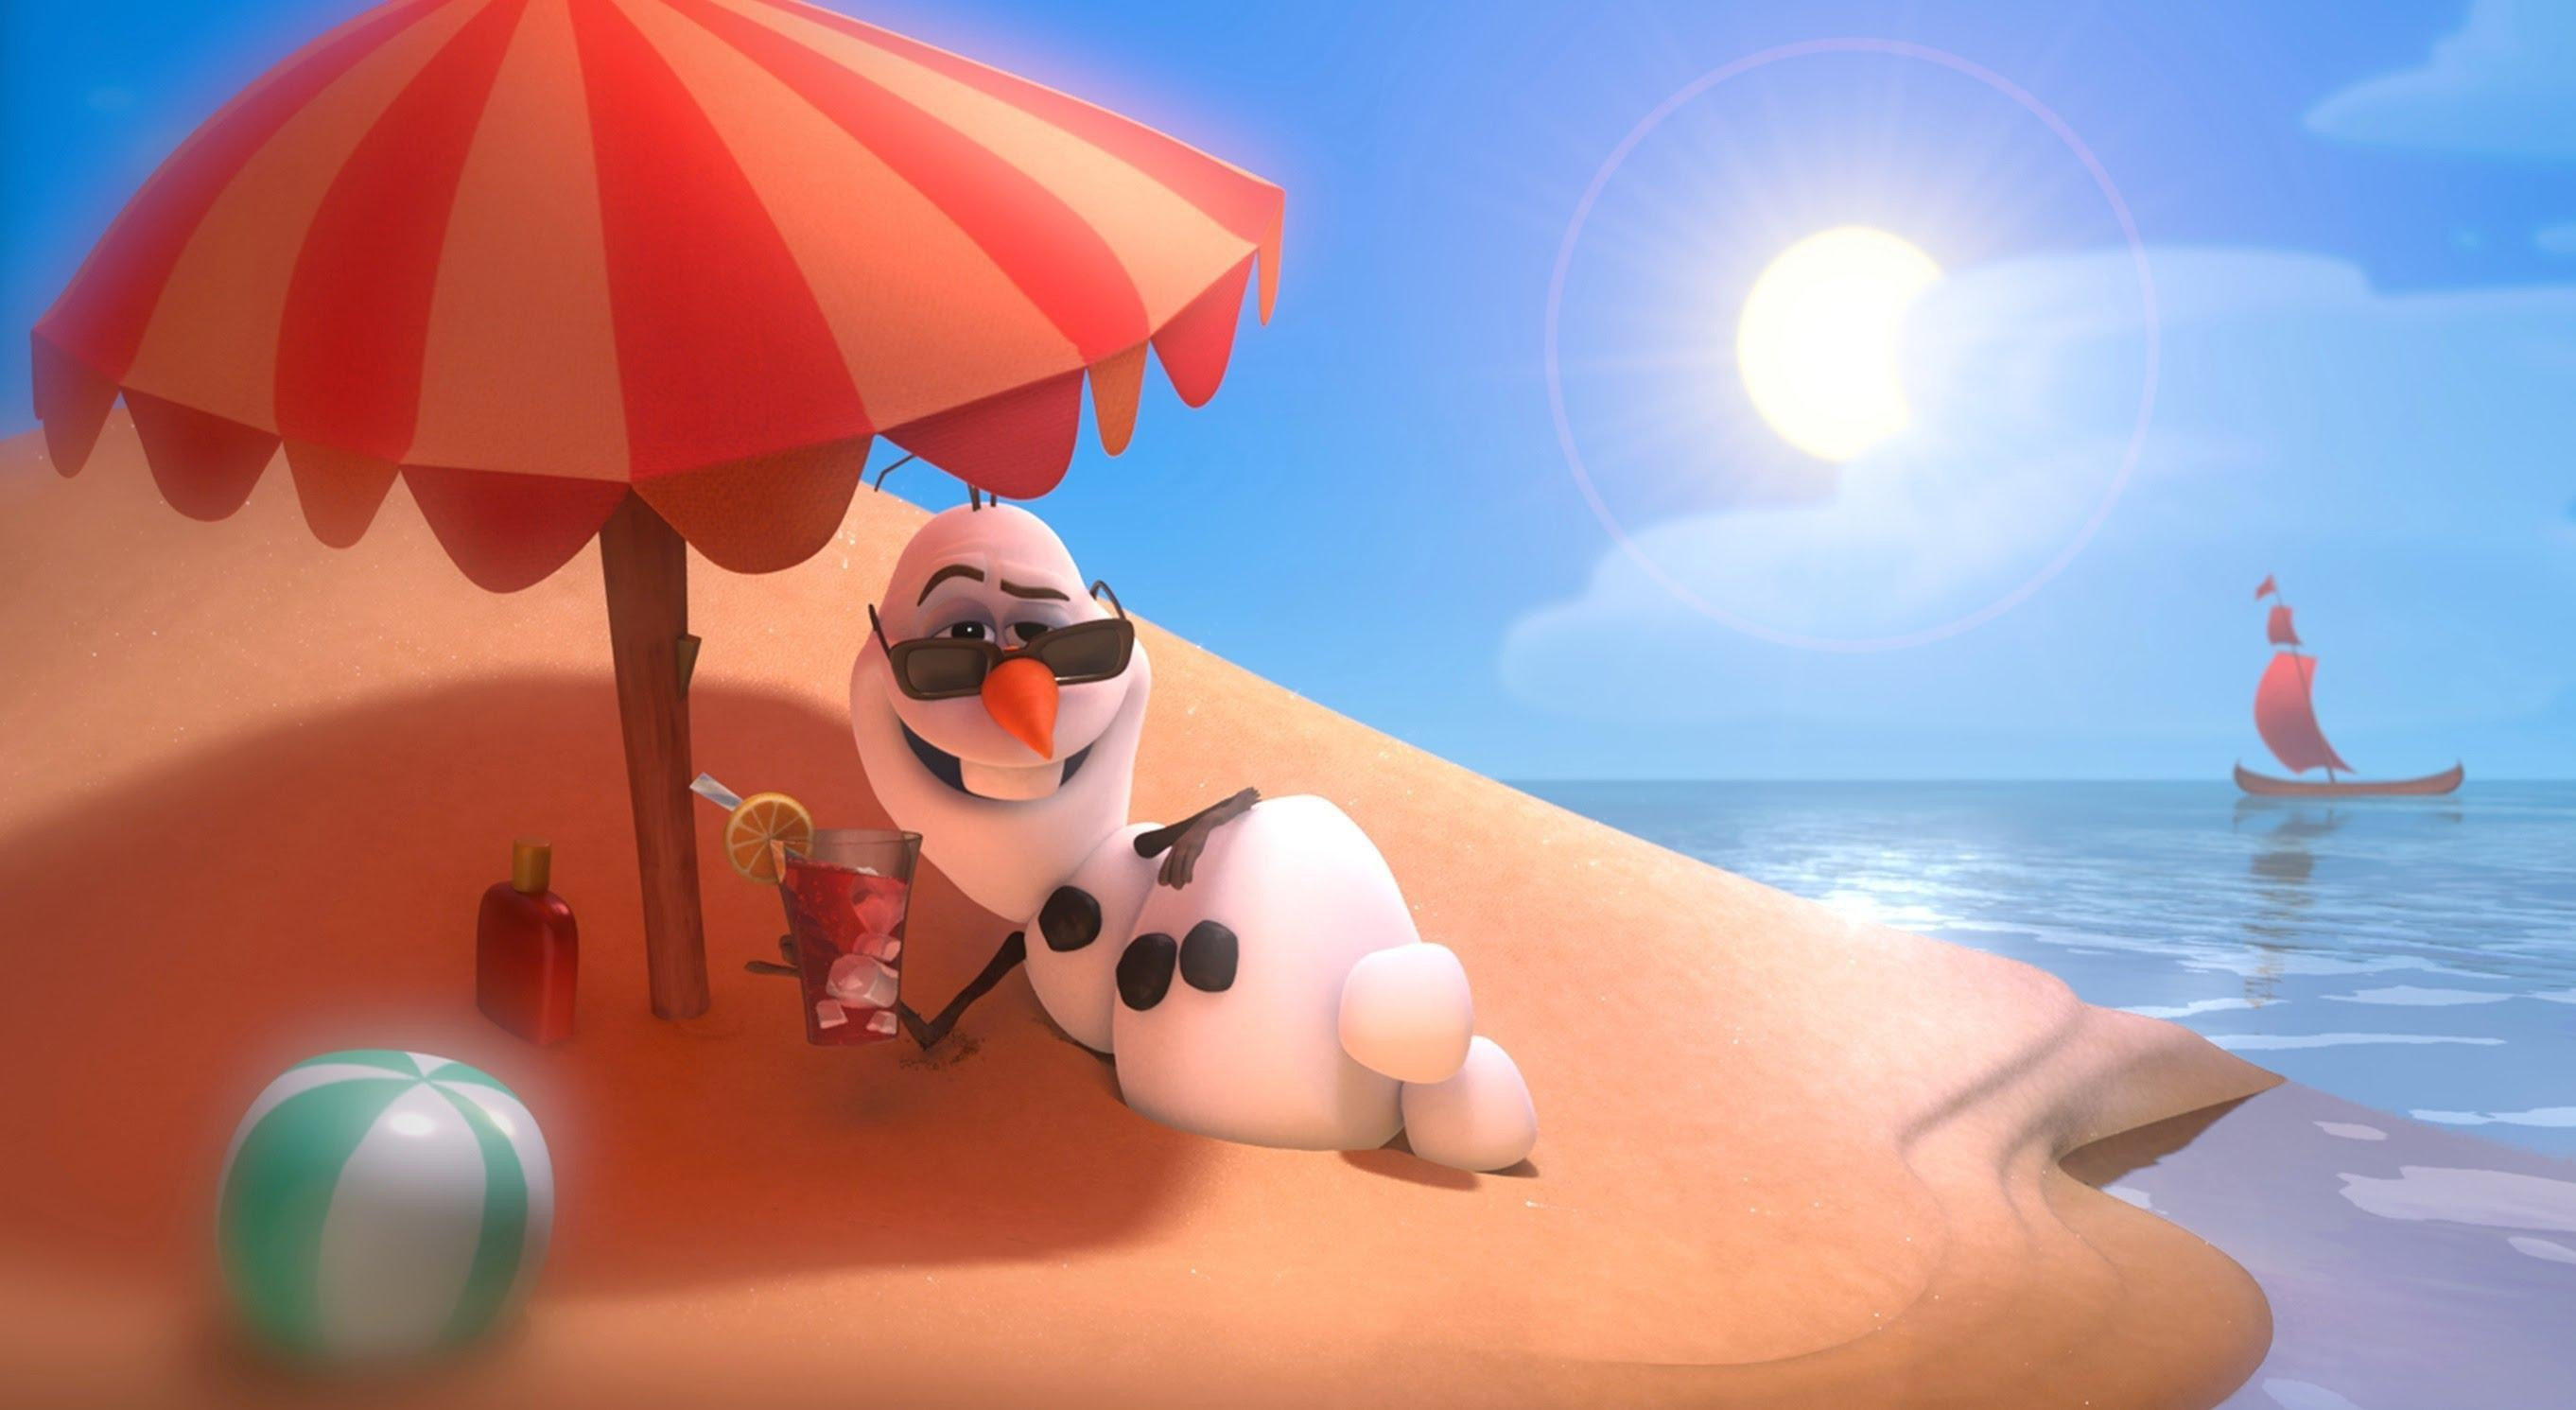 Free Disney screensavers   Disney holiday wallpaper screensavers .